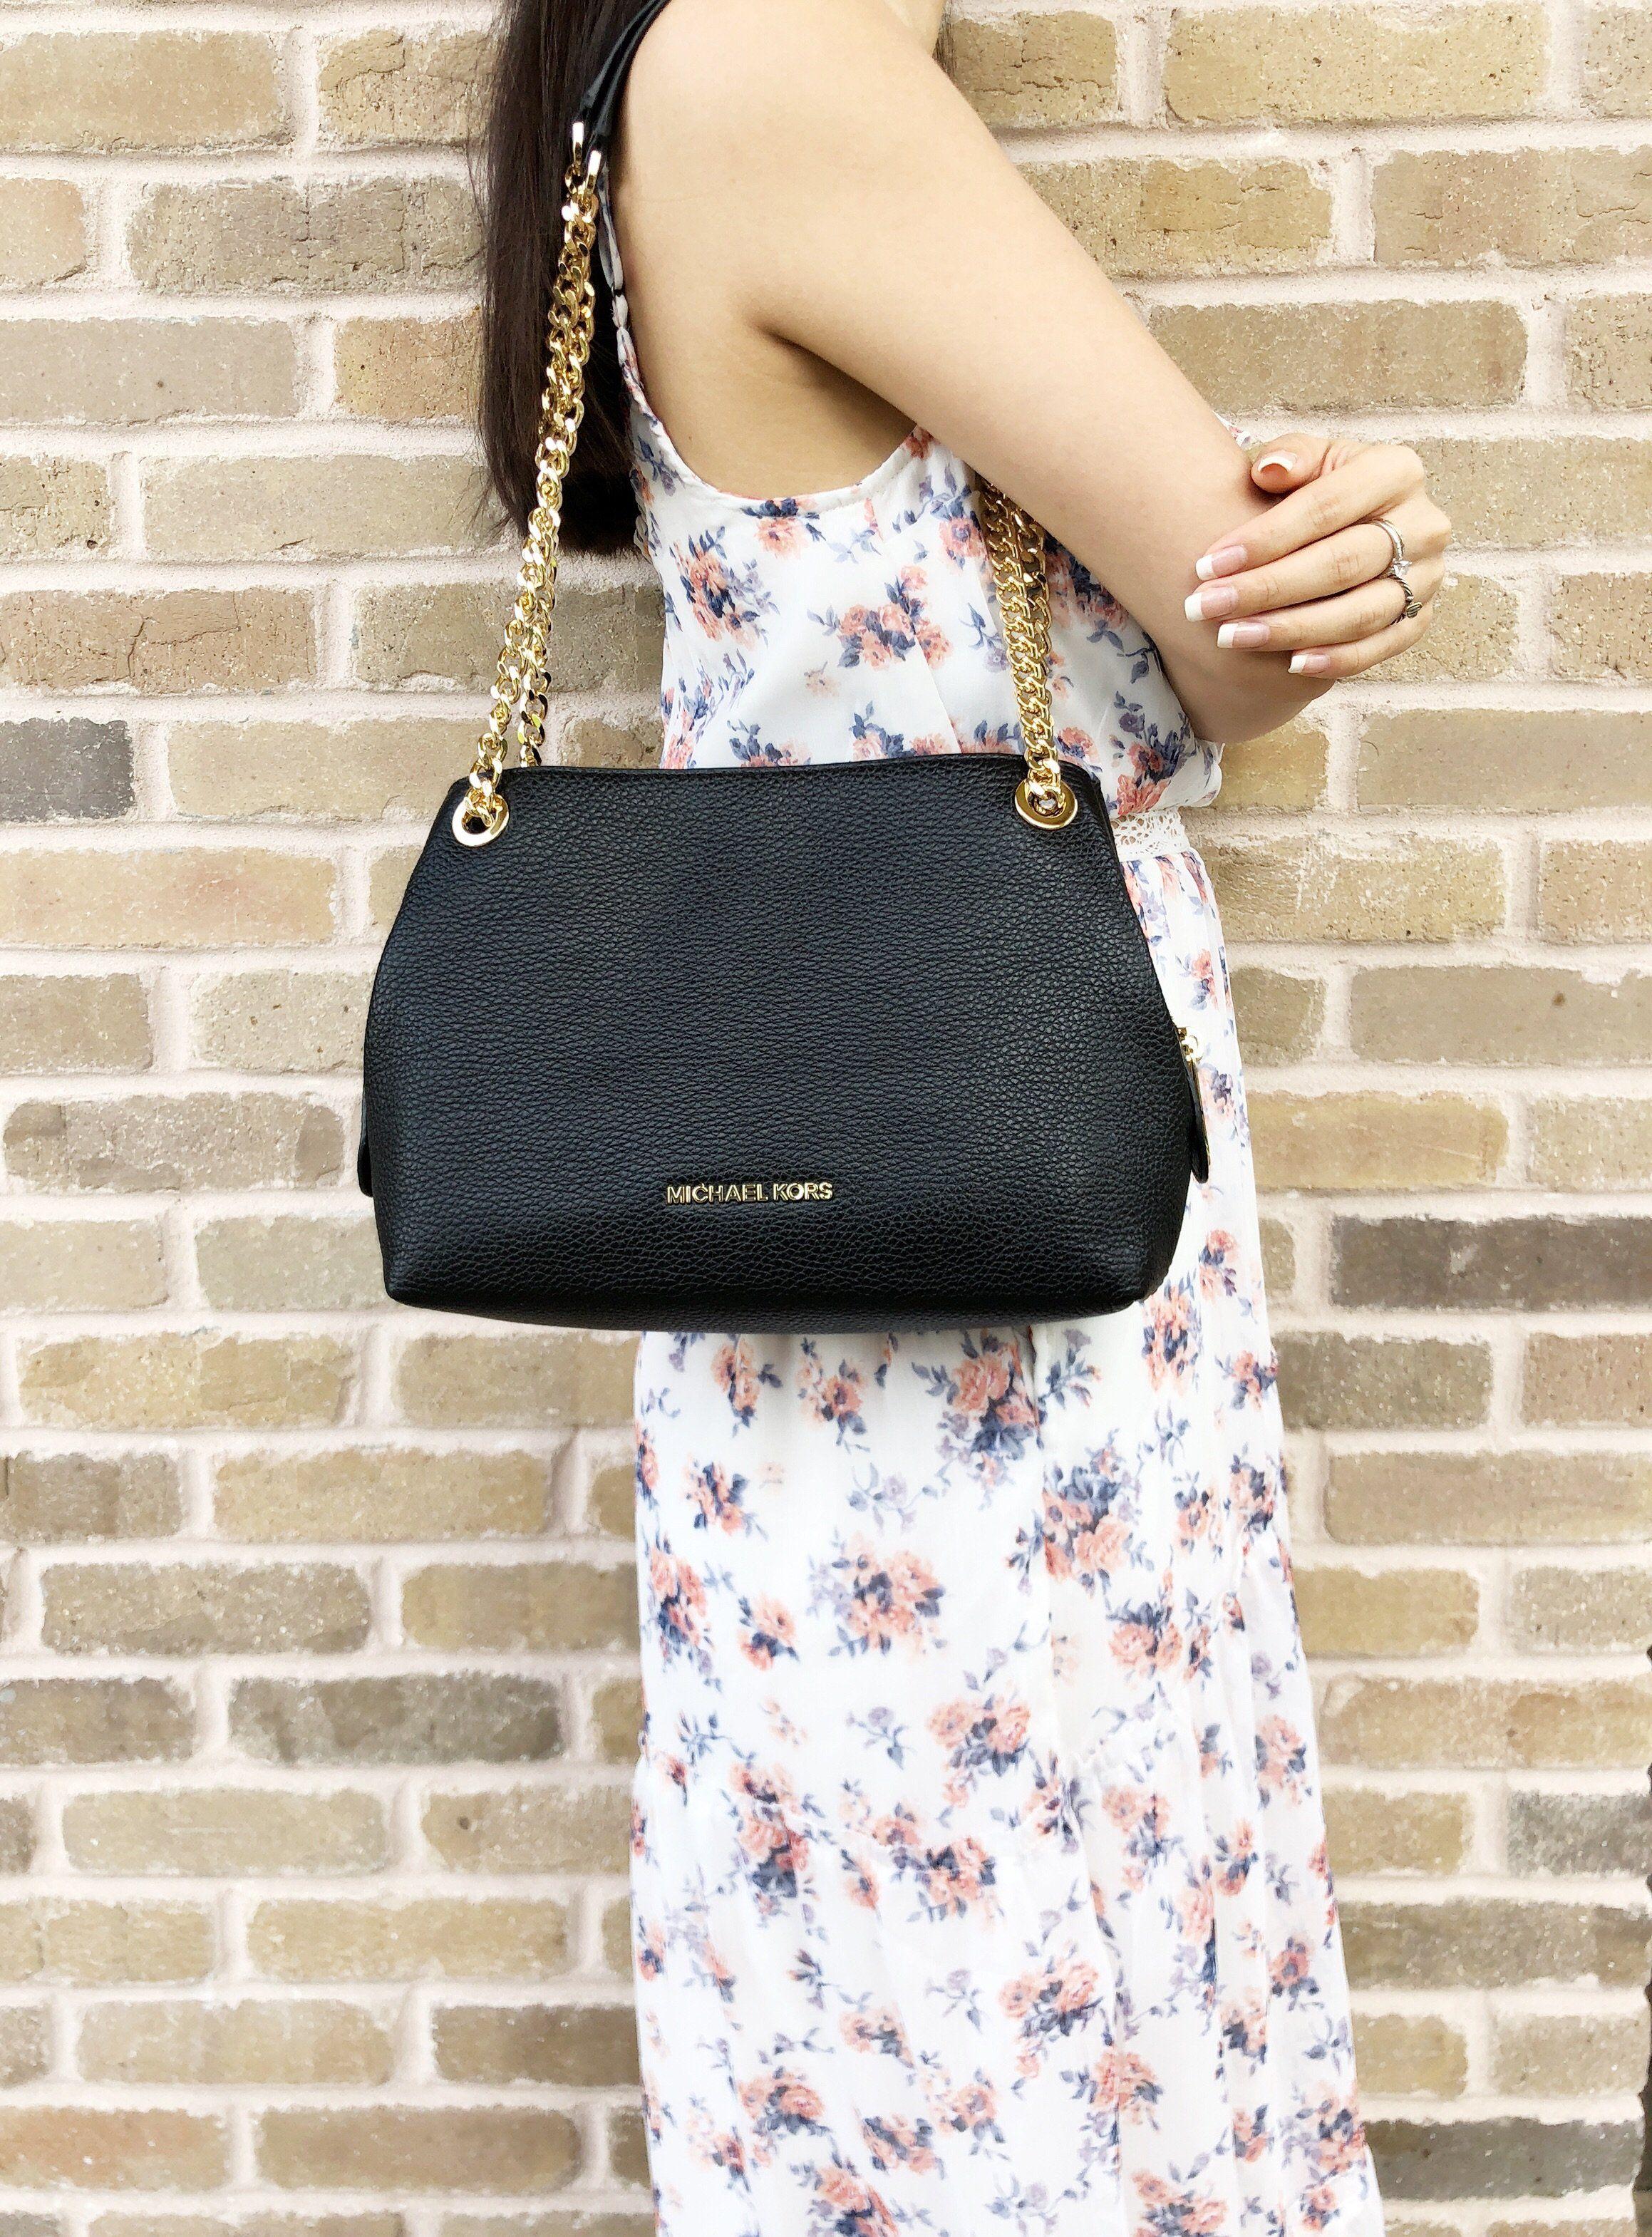 8095e3ef18d3e1 Michael Kors Jet Set Medium Messenger Shoulder Bag Chain Tote black #MK  #Handbags #MichaelKors